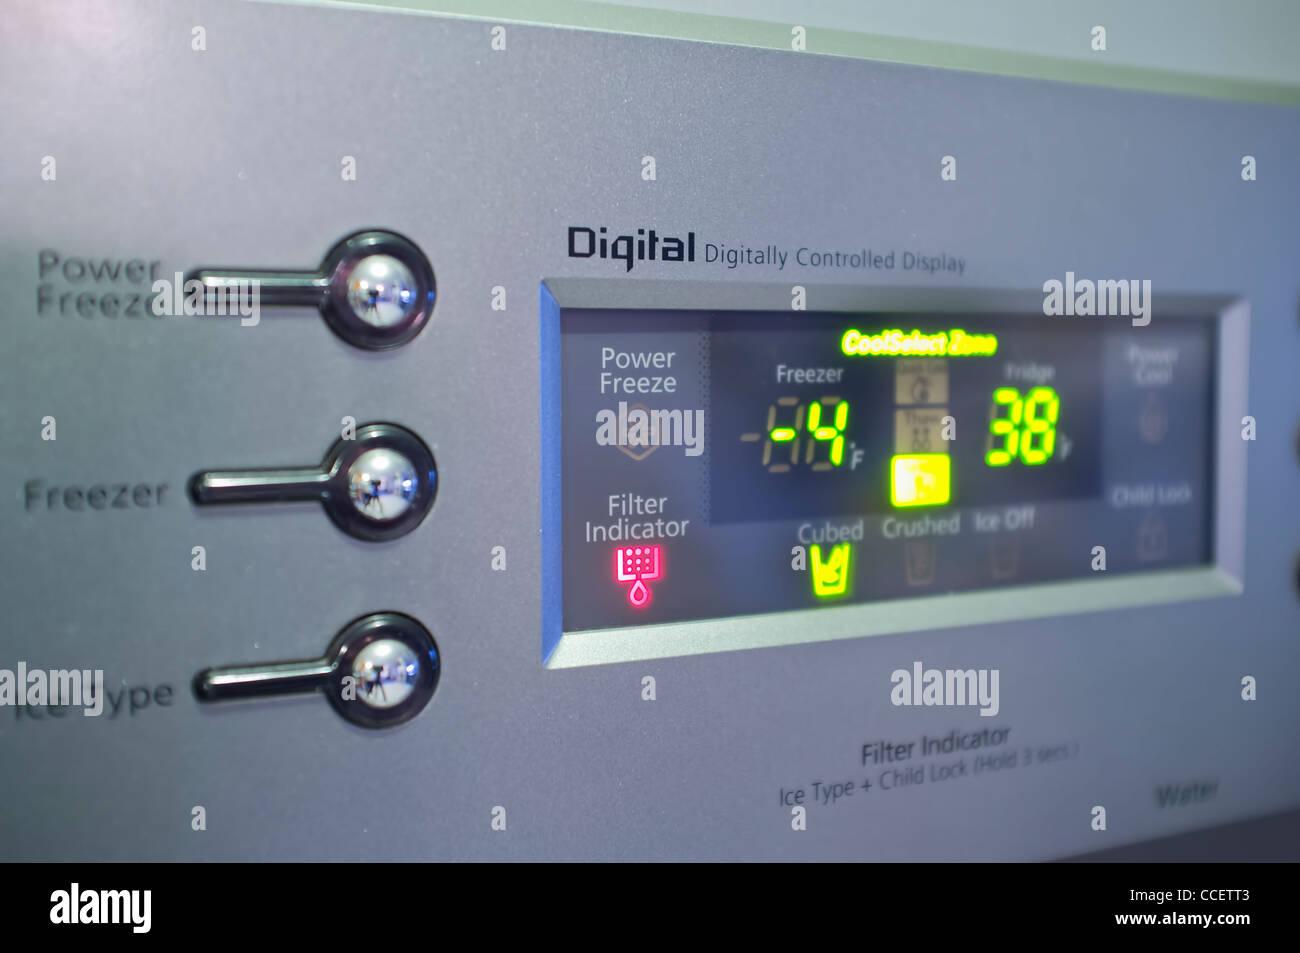 Side By Side Kühlschrank Display : Digitale anzeige der modernen side by side kühlschrank stockfoto